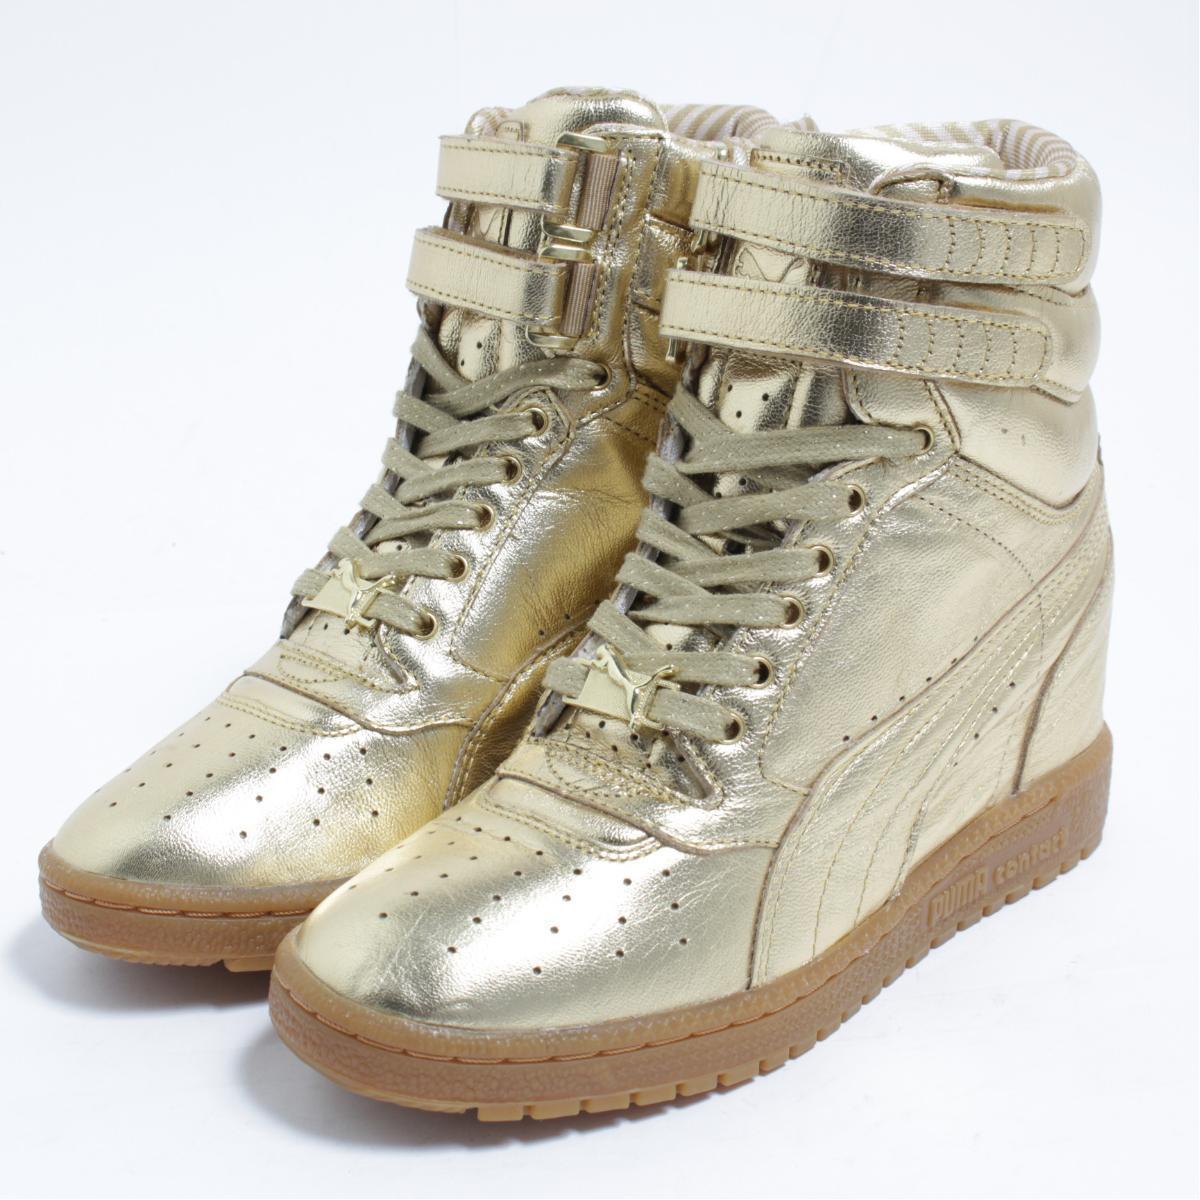 f5875c3ad45 VINTAGE CLOTHING JAM  Puma PUMA SKY WEDGE sneakers US7 Lady s 24.0cm ...